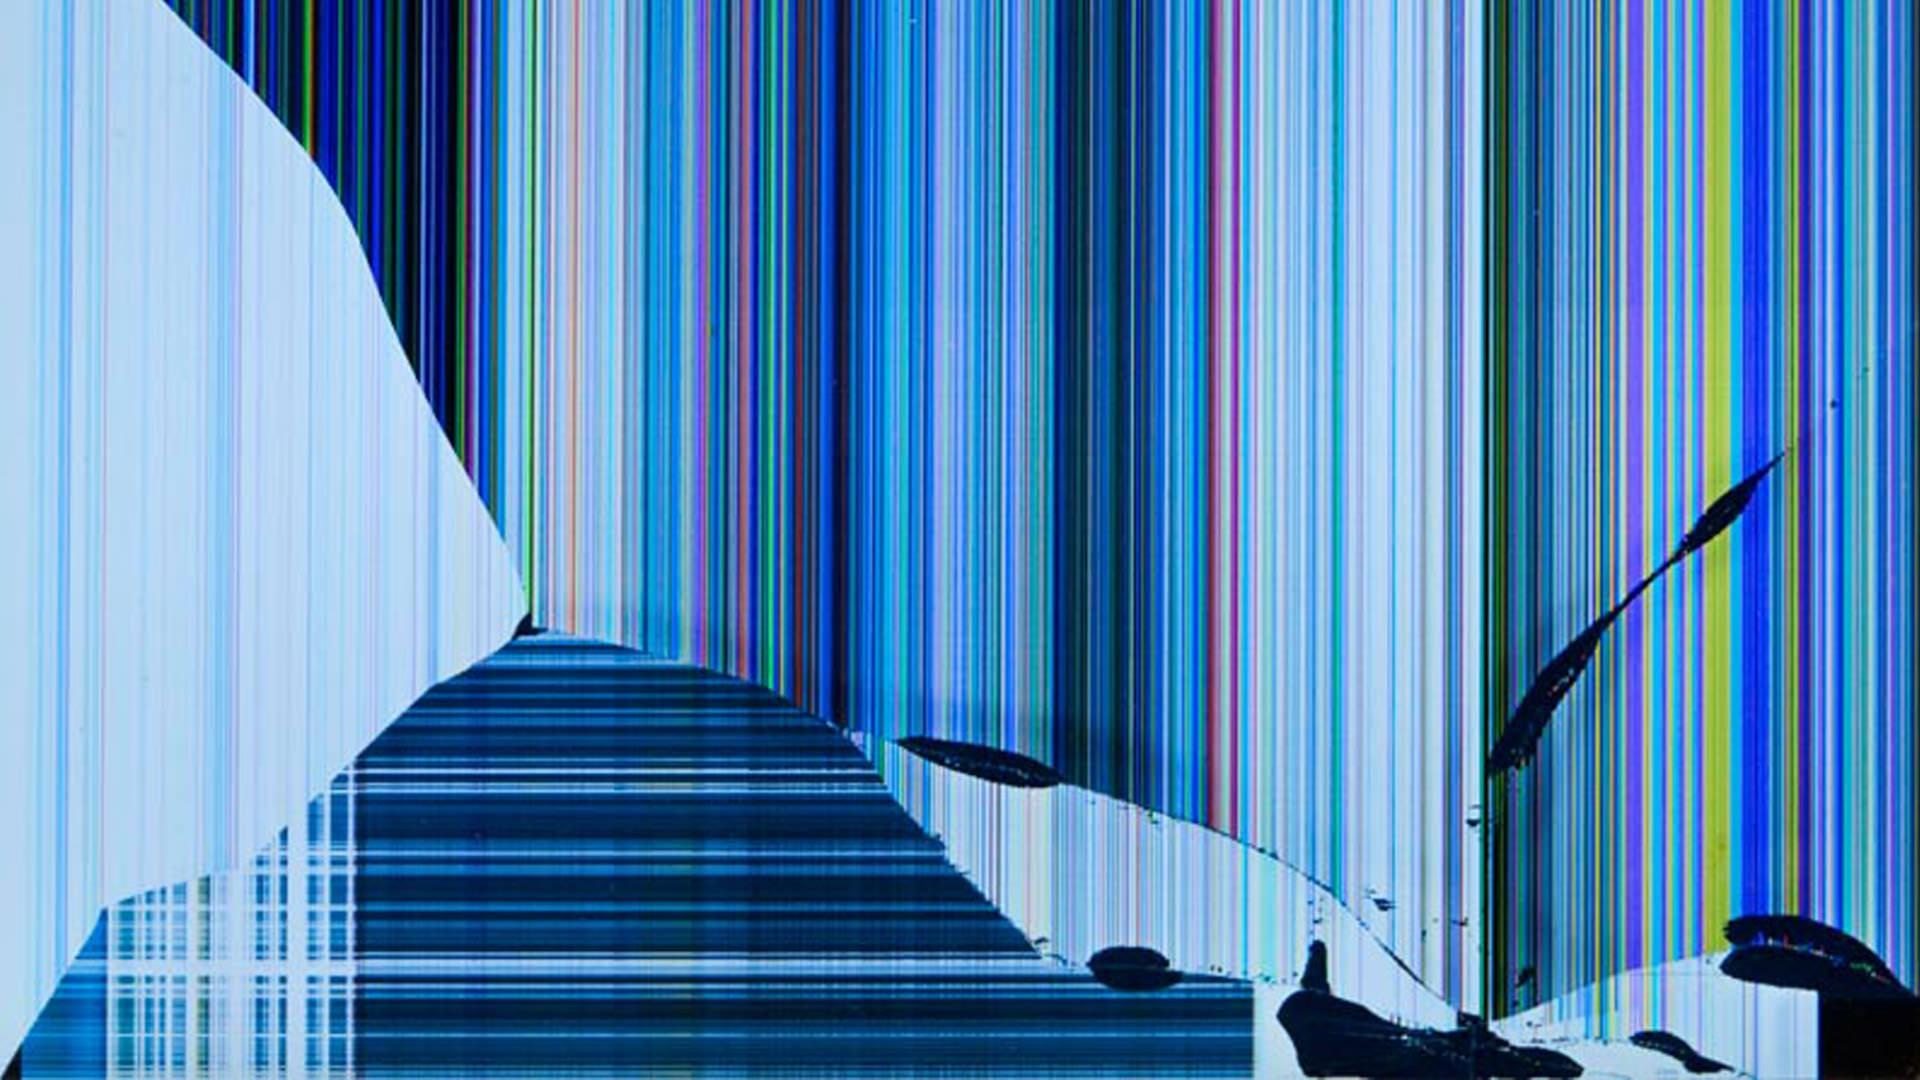 Broken Screen Wallpaper Download Free Stunning Hd Wallpapers For